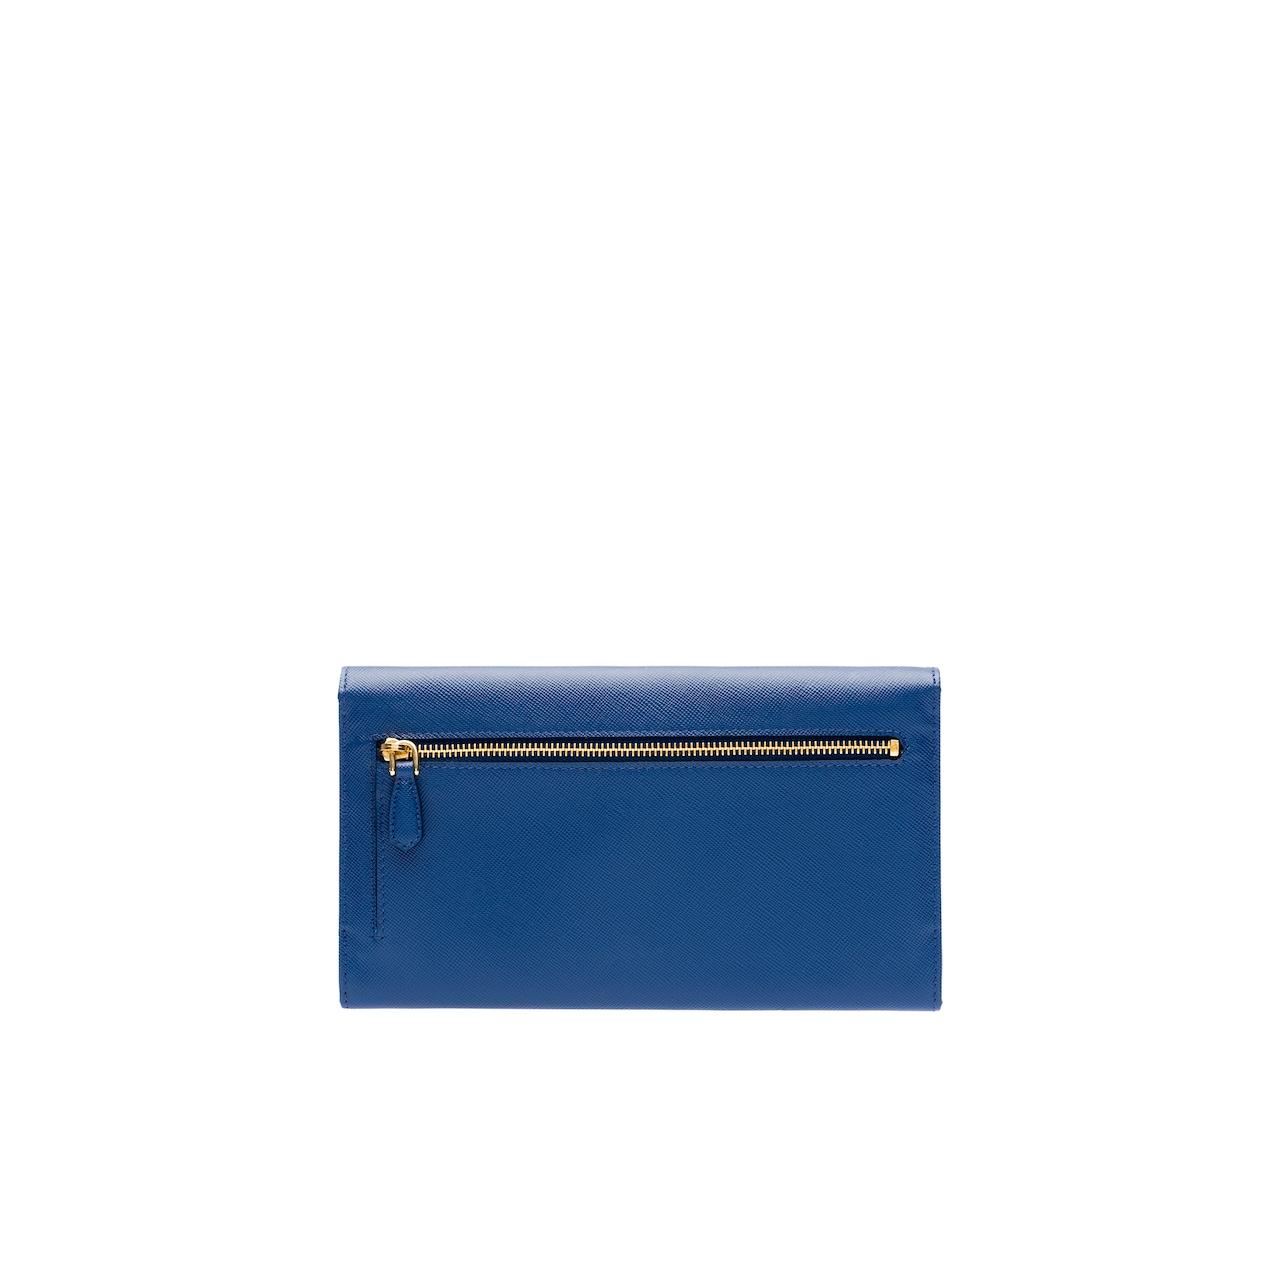 Prada Leather Wallet 5